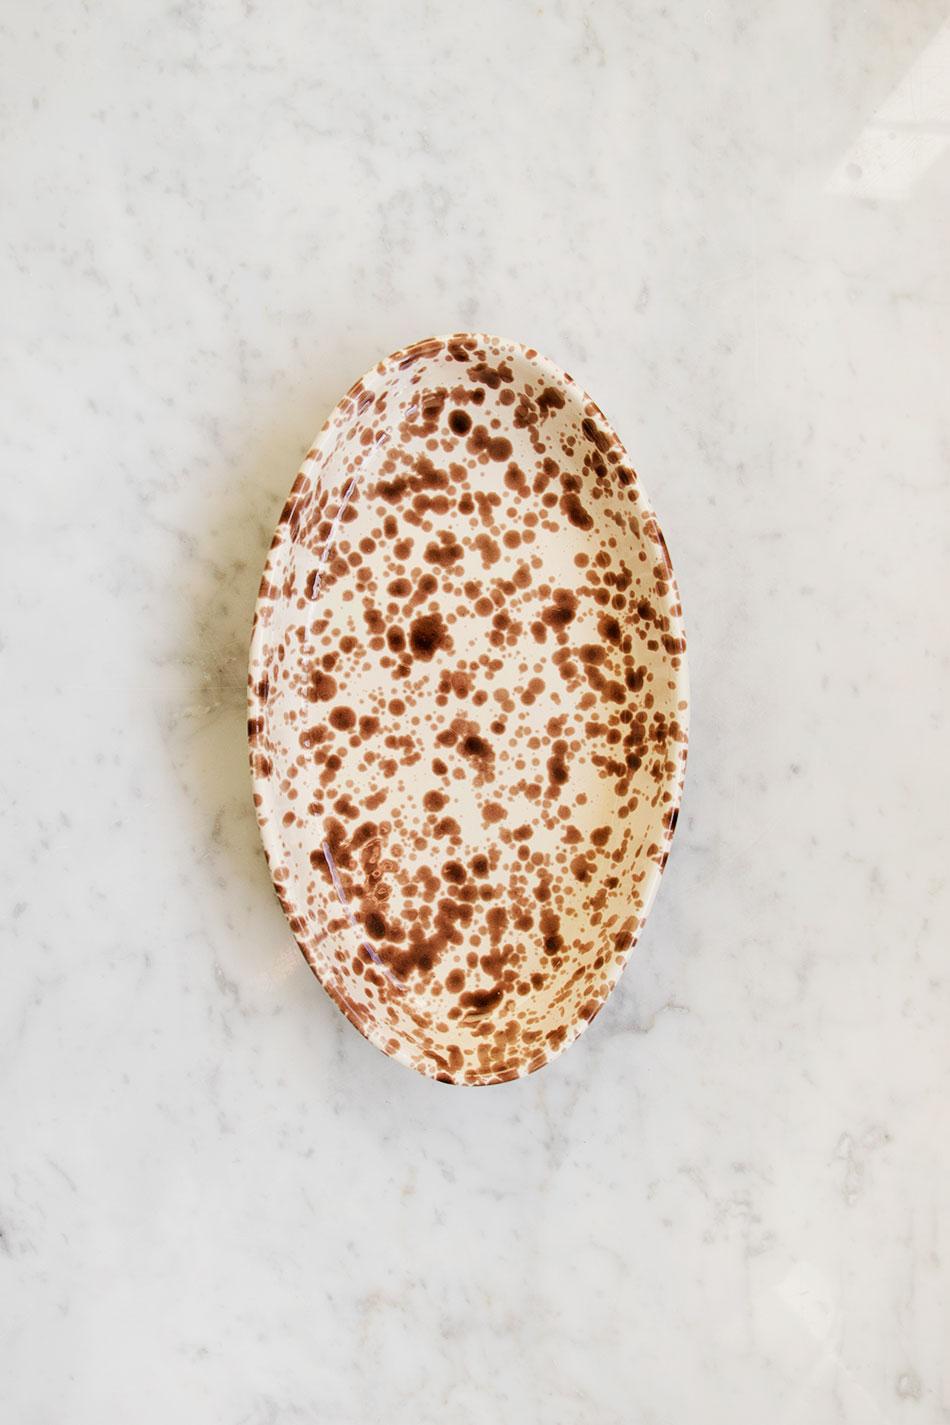 Ugnsform Spruzzi Cioccolato